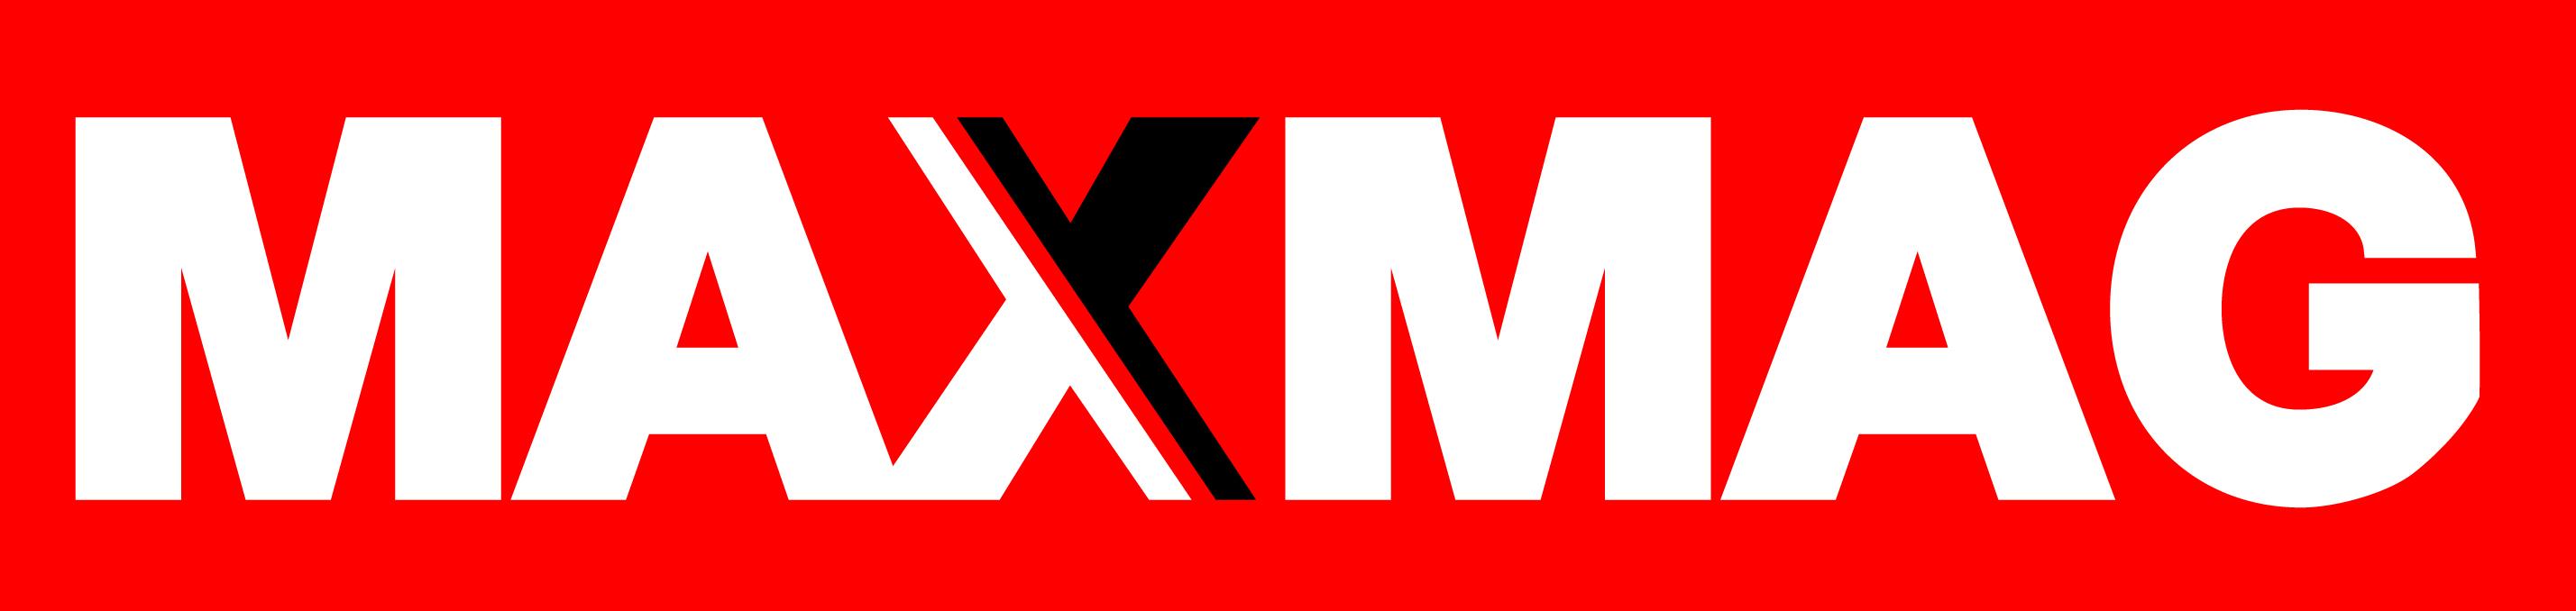 maxmag_logo